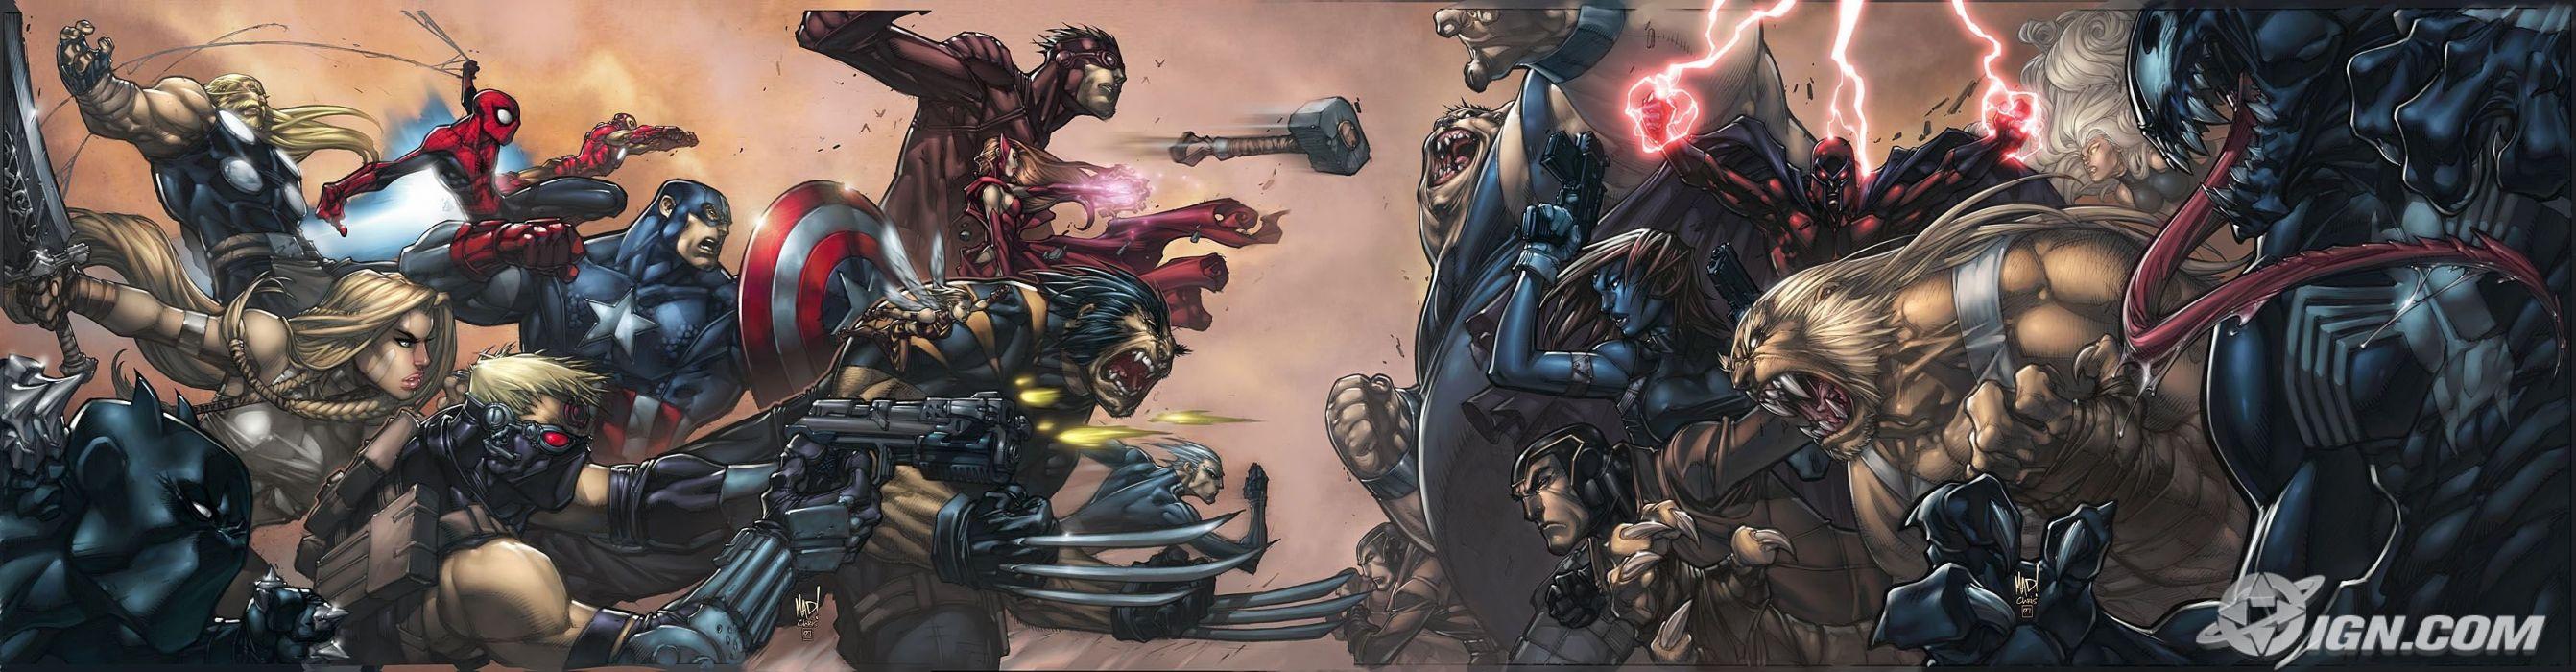 Venom Spider-Man Captain America Wolverine superheroes Magneto wallpaper